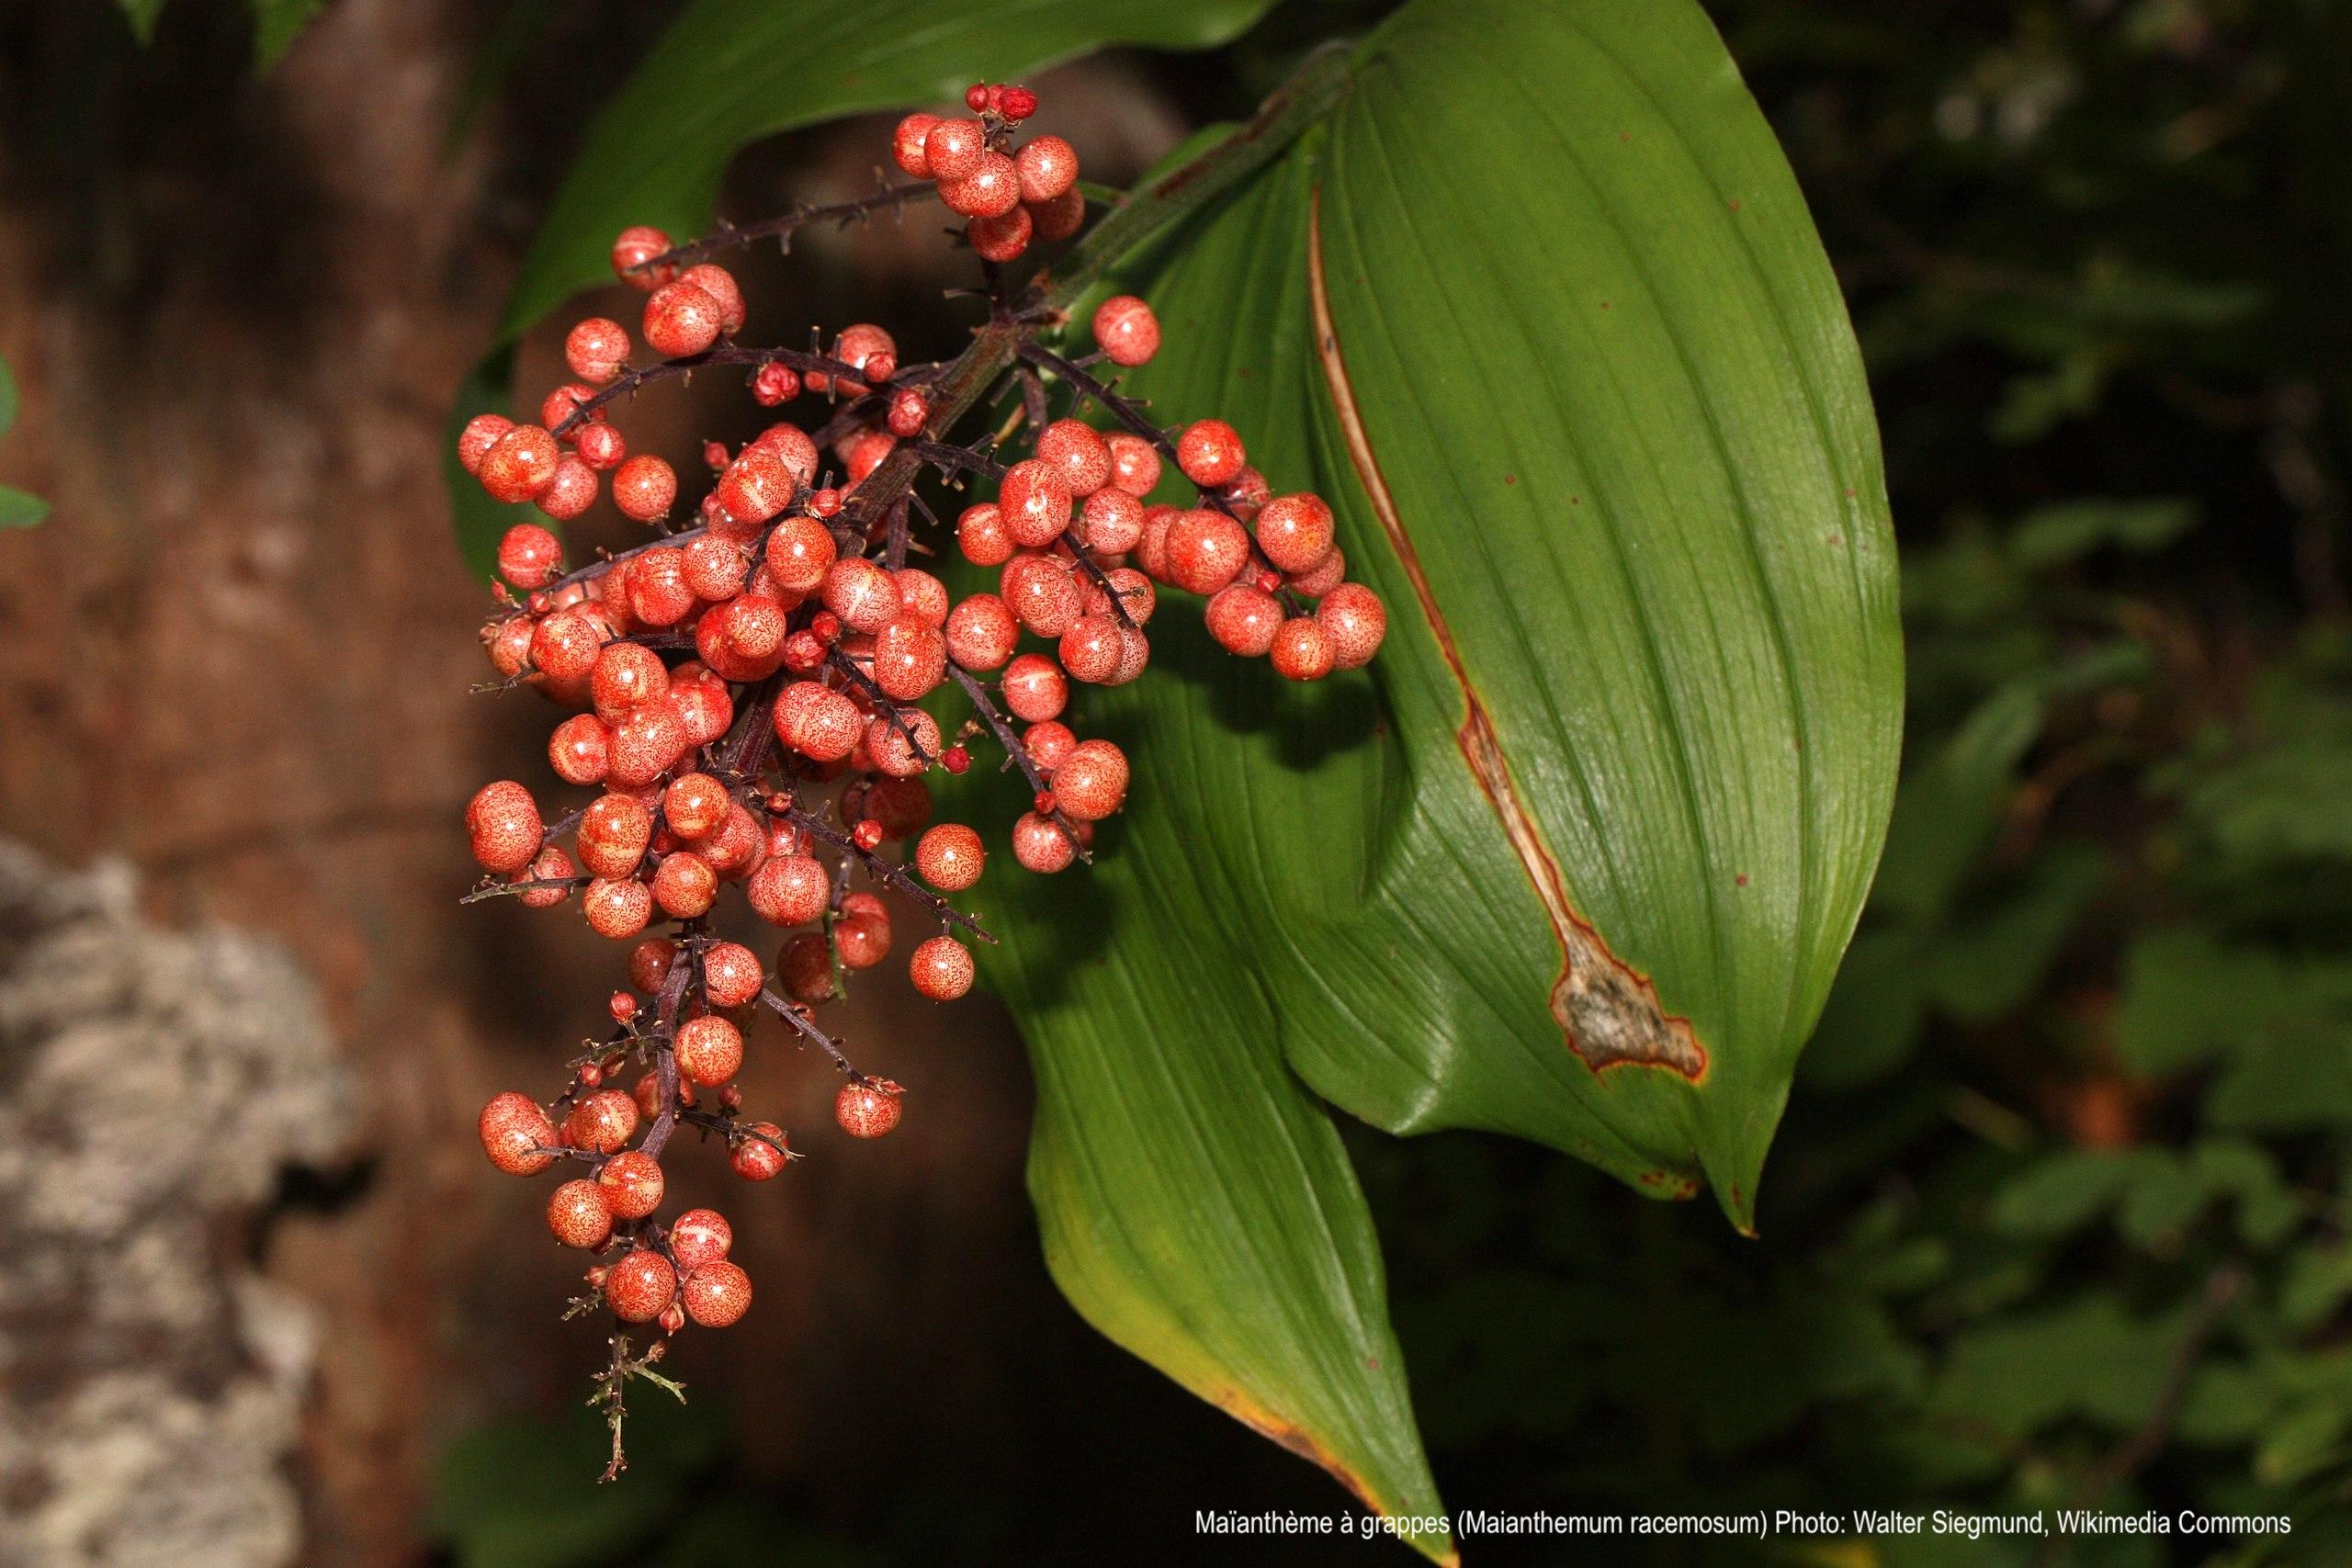 Maianthemum racemosum en fruits